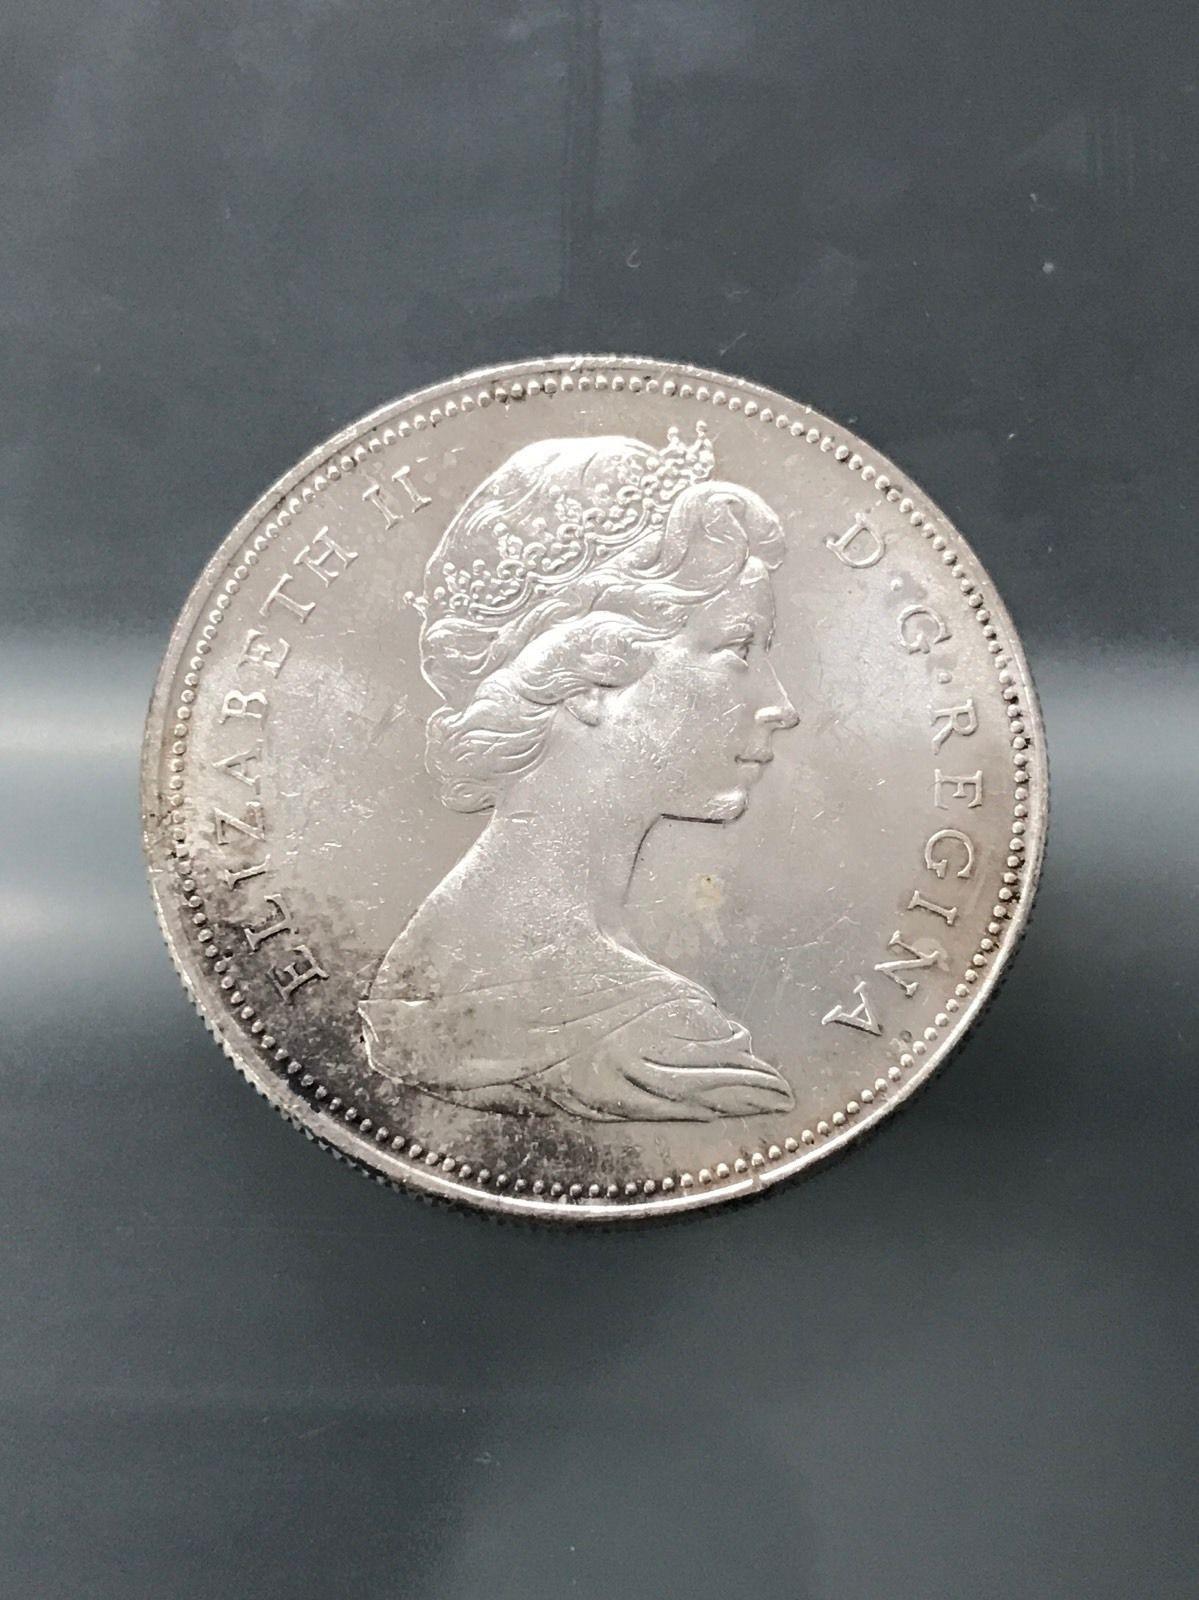 1966 S 1 Silver Canada Dollar Large Beads 4 22 17 Shopnetone Dollar Silver Beads